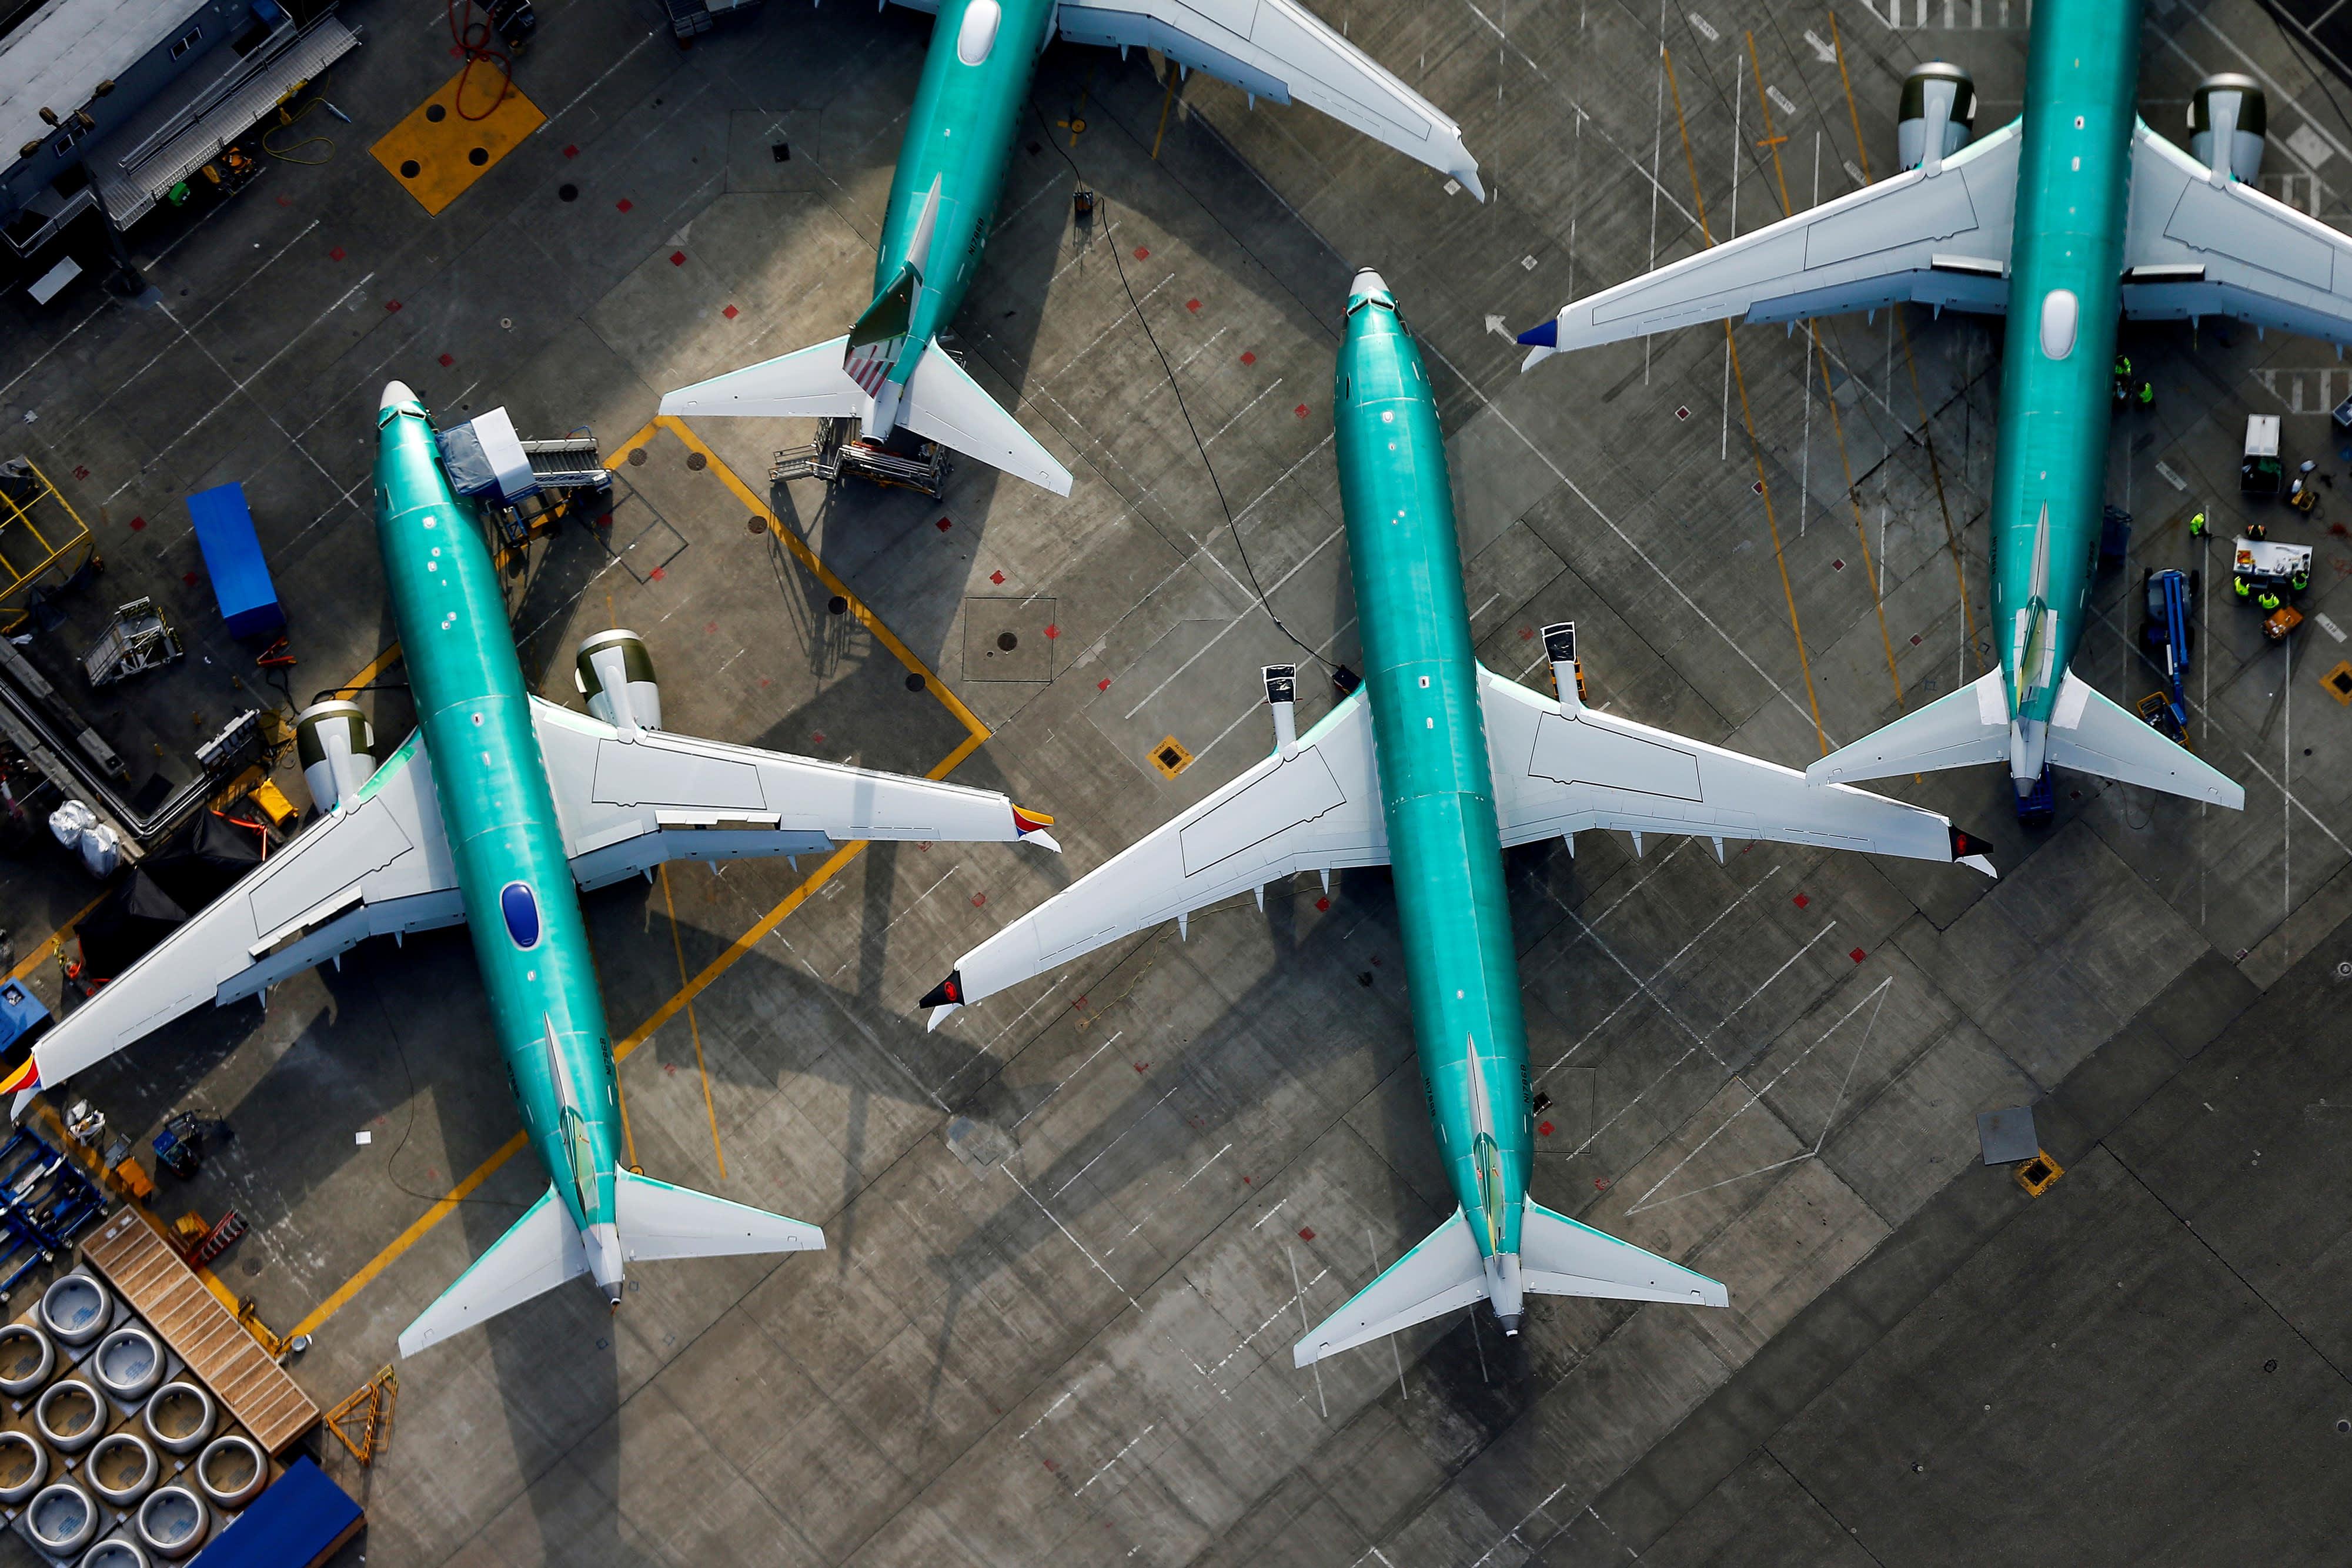 Boeing seeks $60 billion in aid for aerospace sector